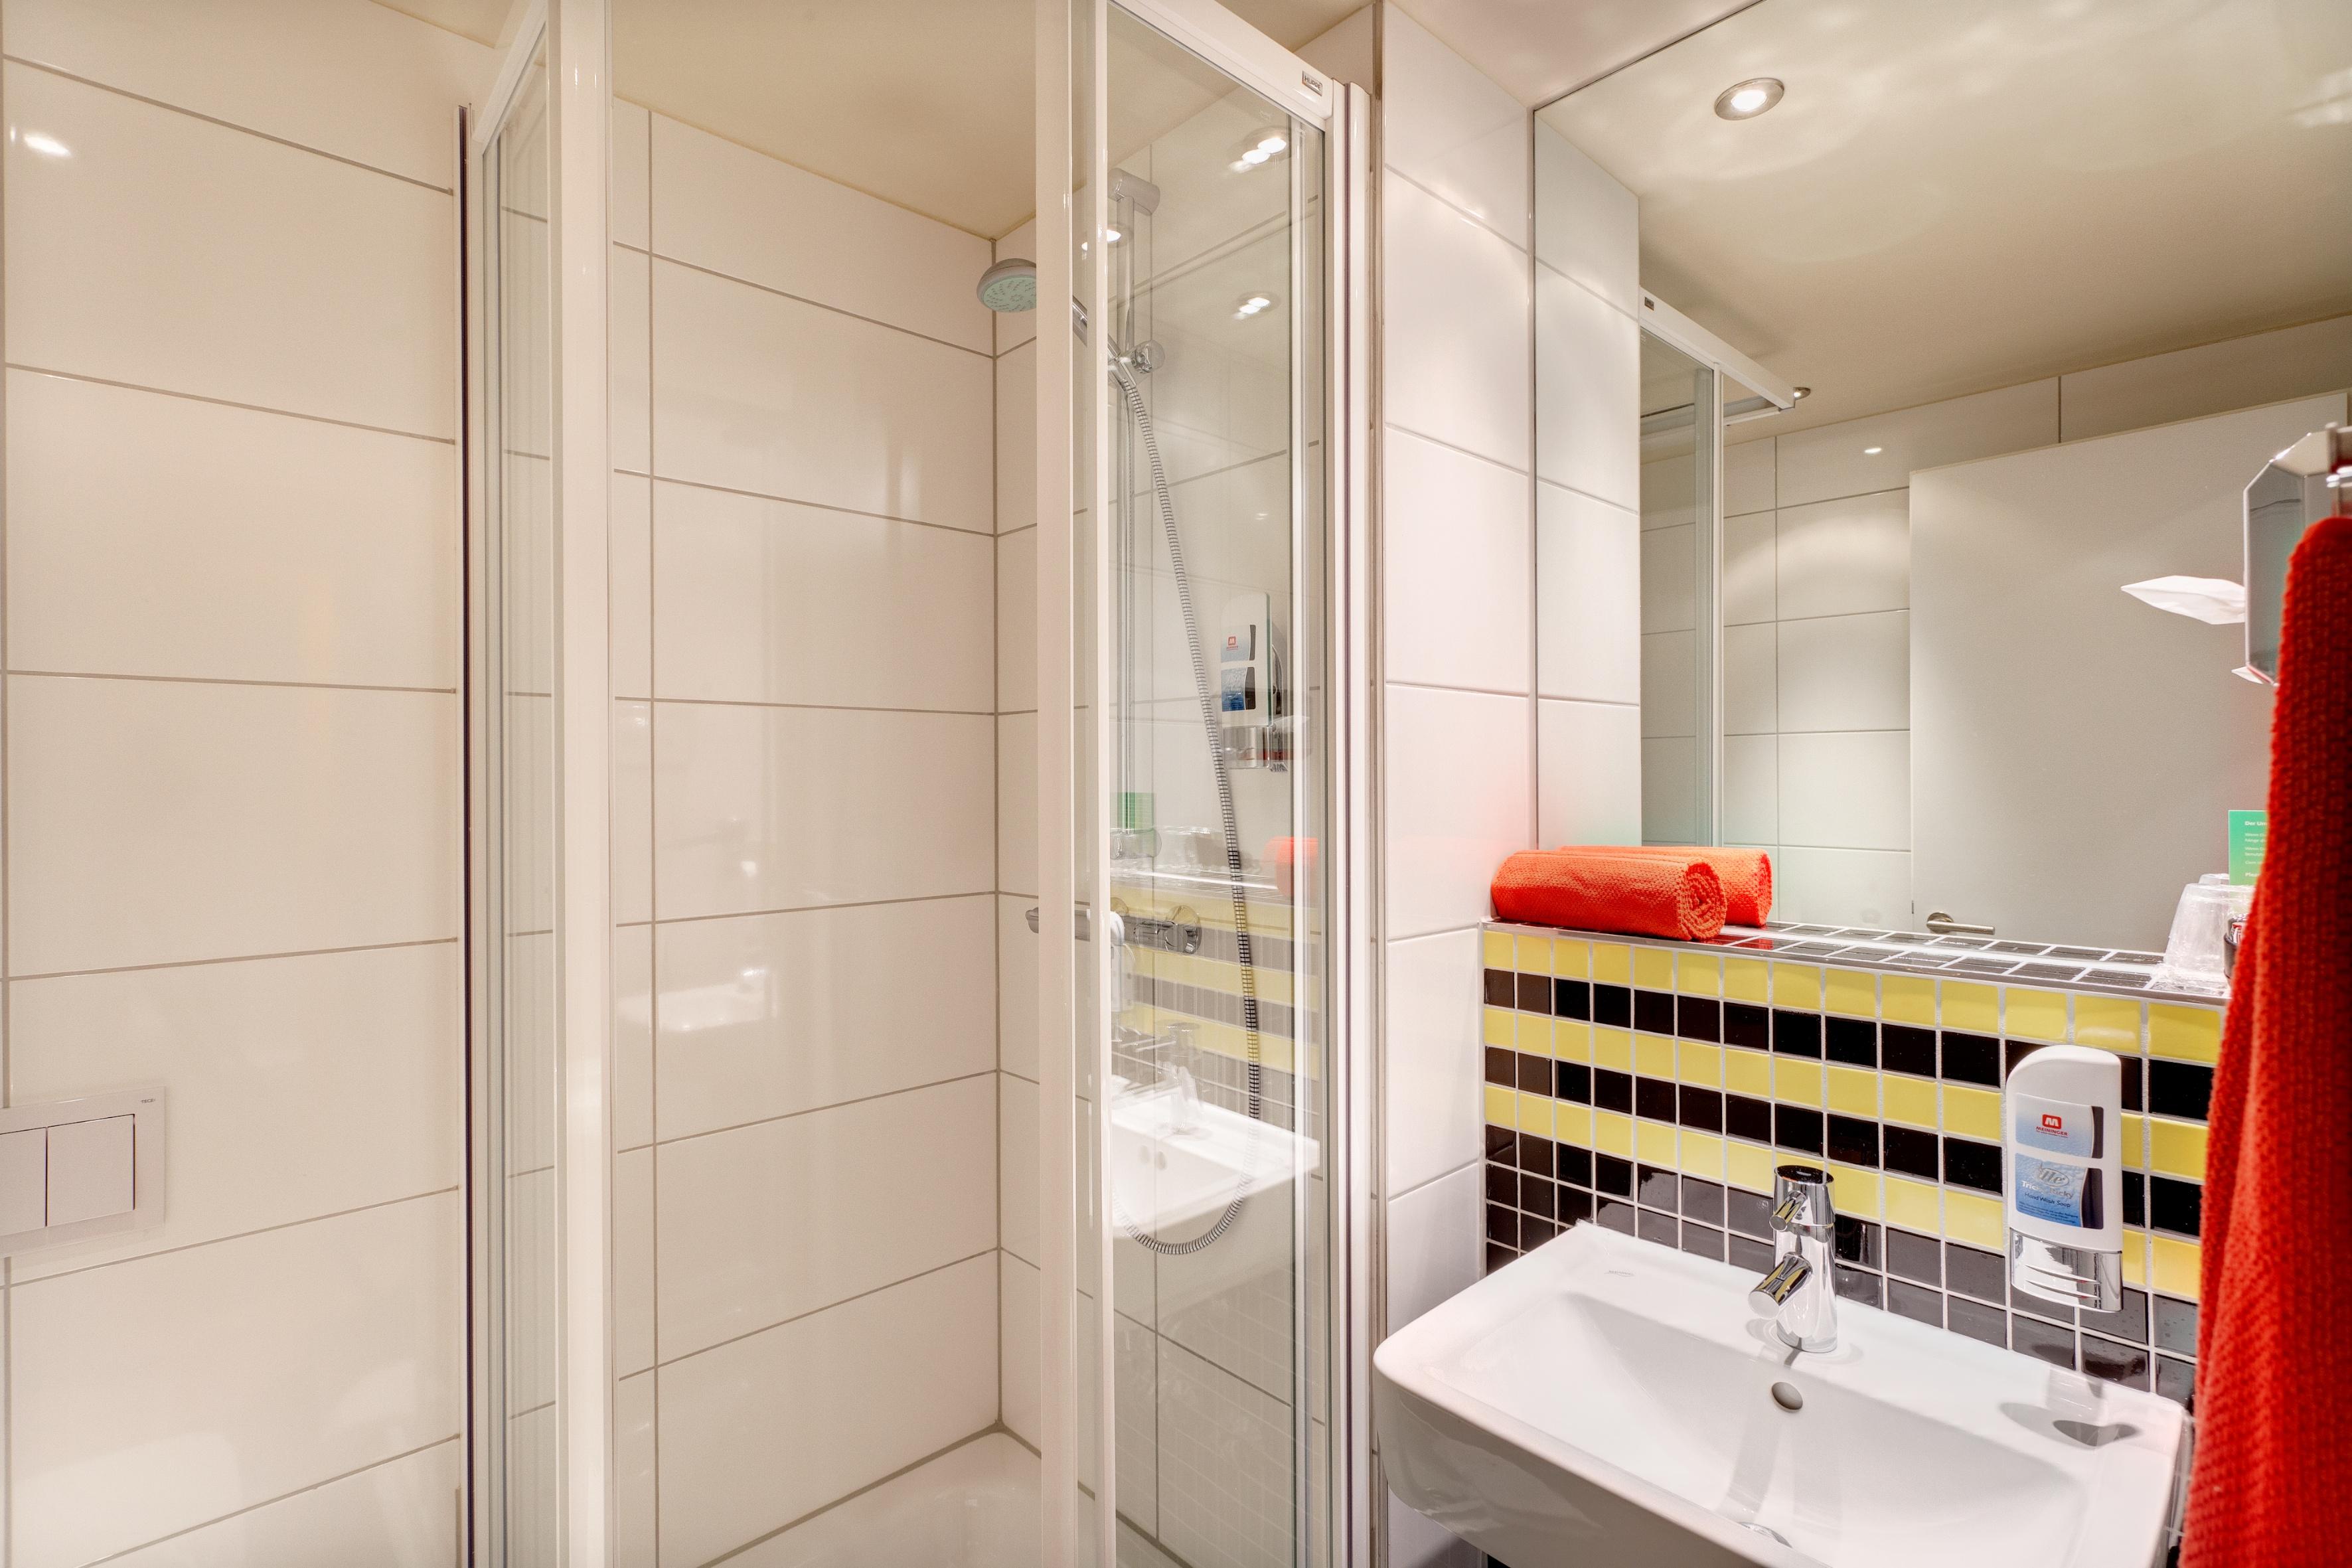 MEININGER Hotel Frankfurt/Main Airport - Dormitory